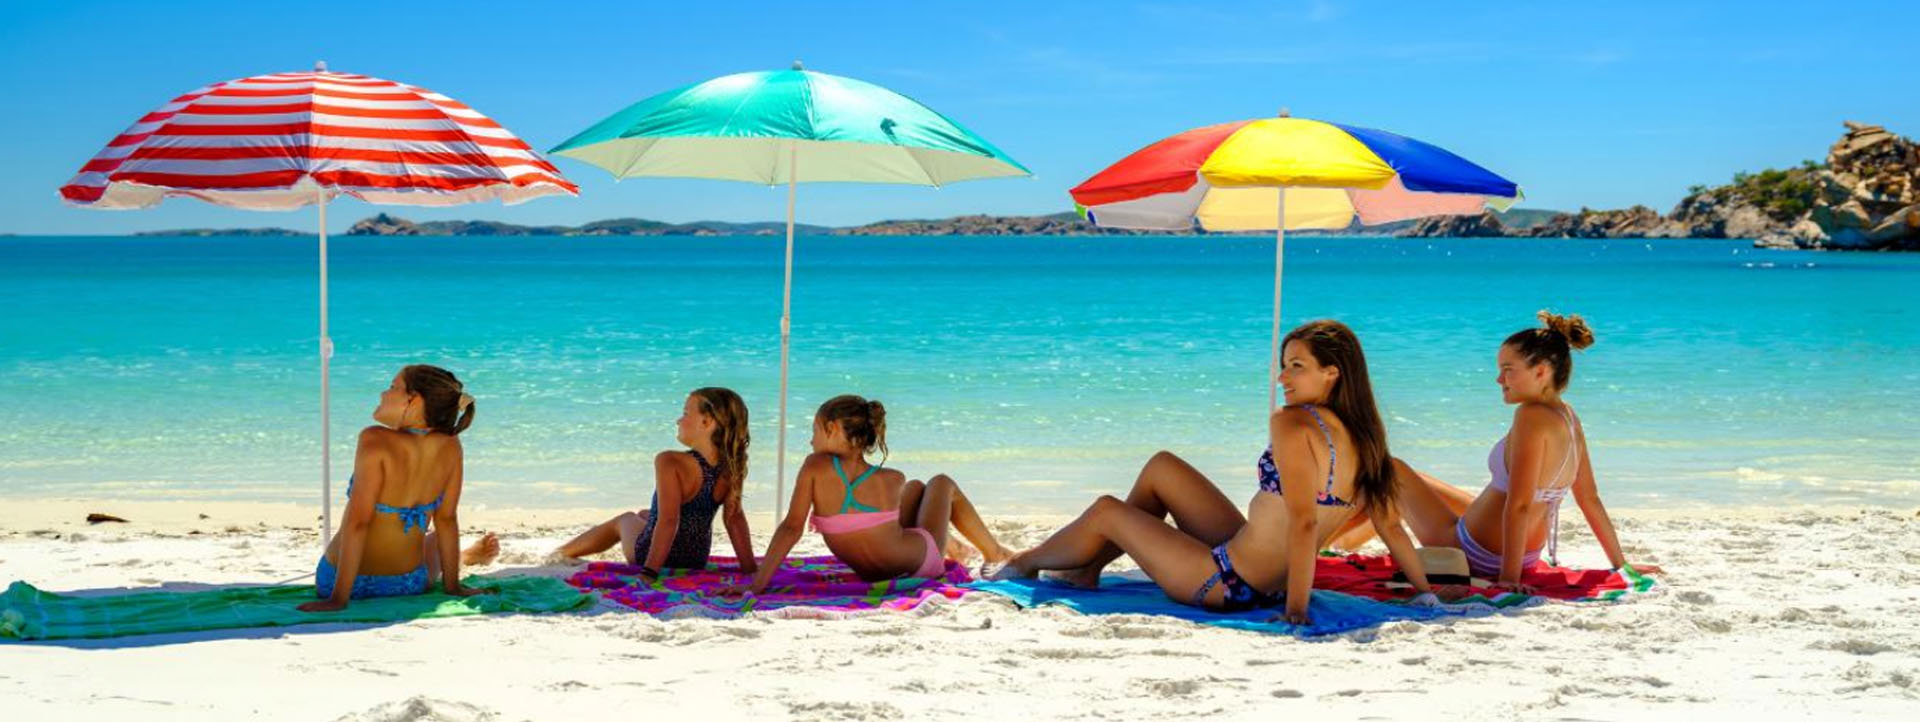 BUCCANEER archipelago girls on beach